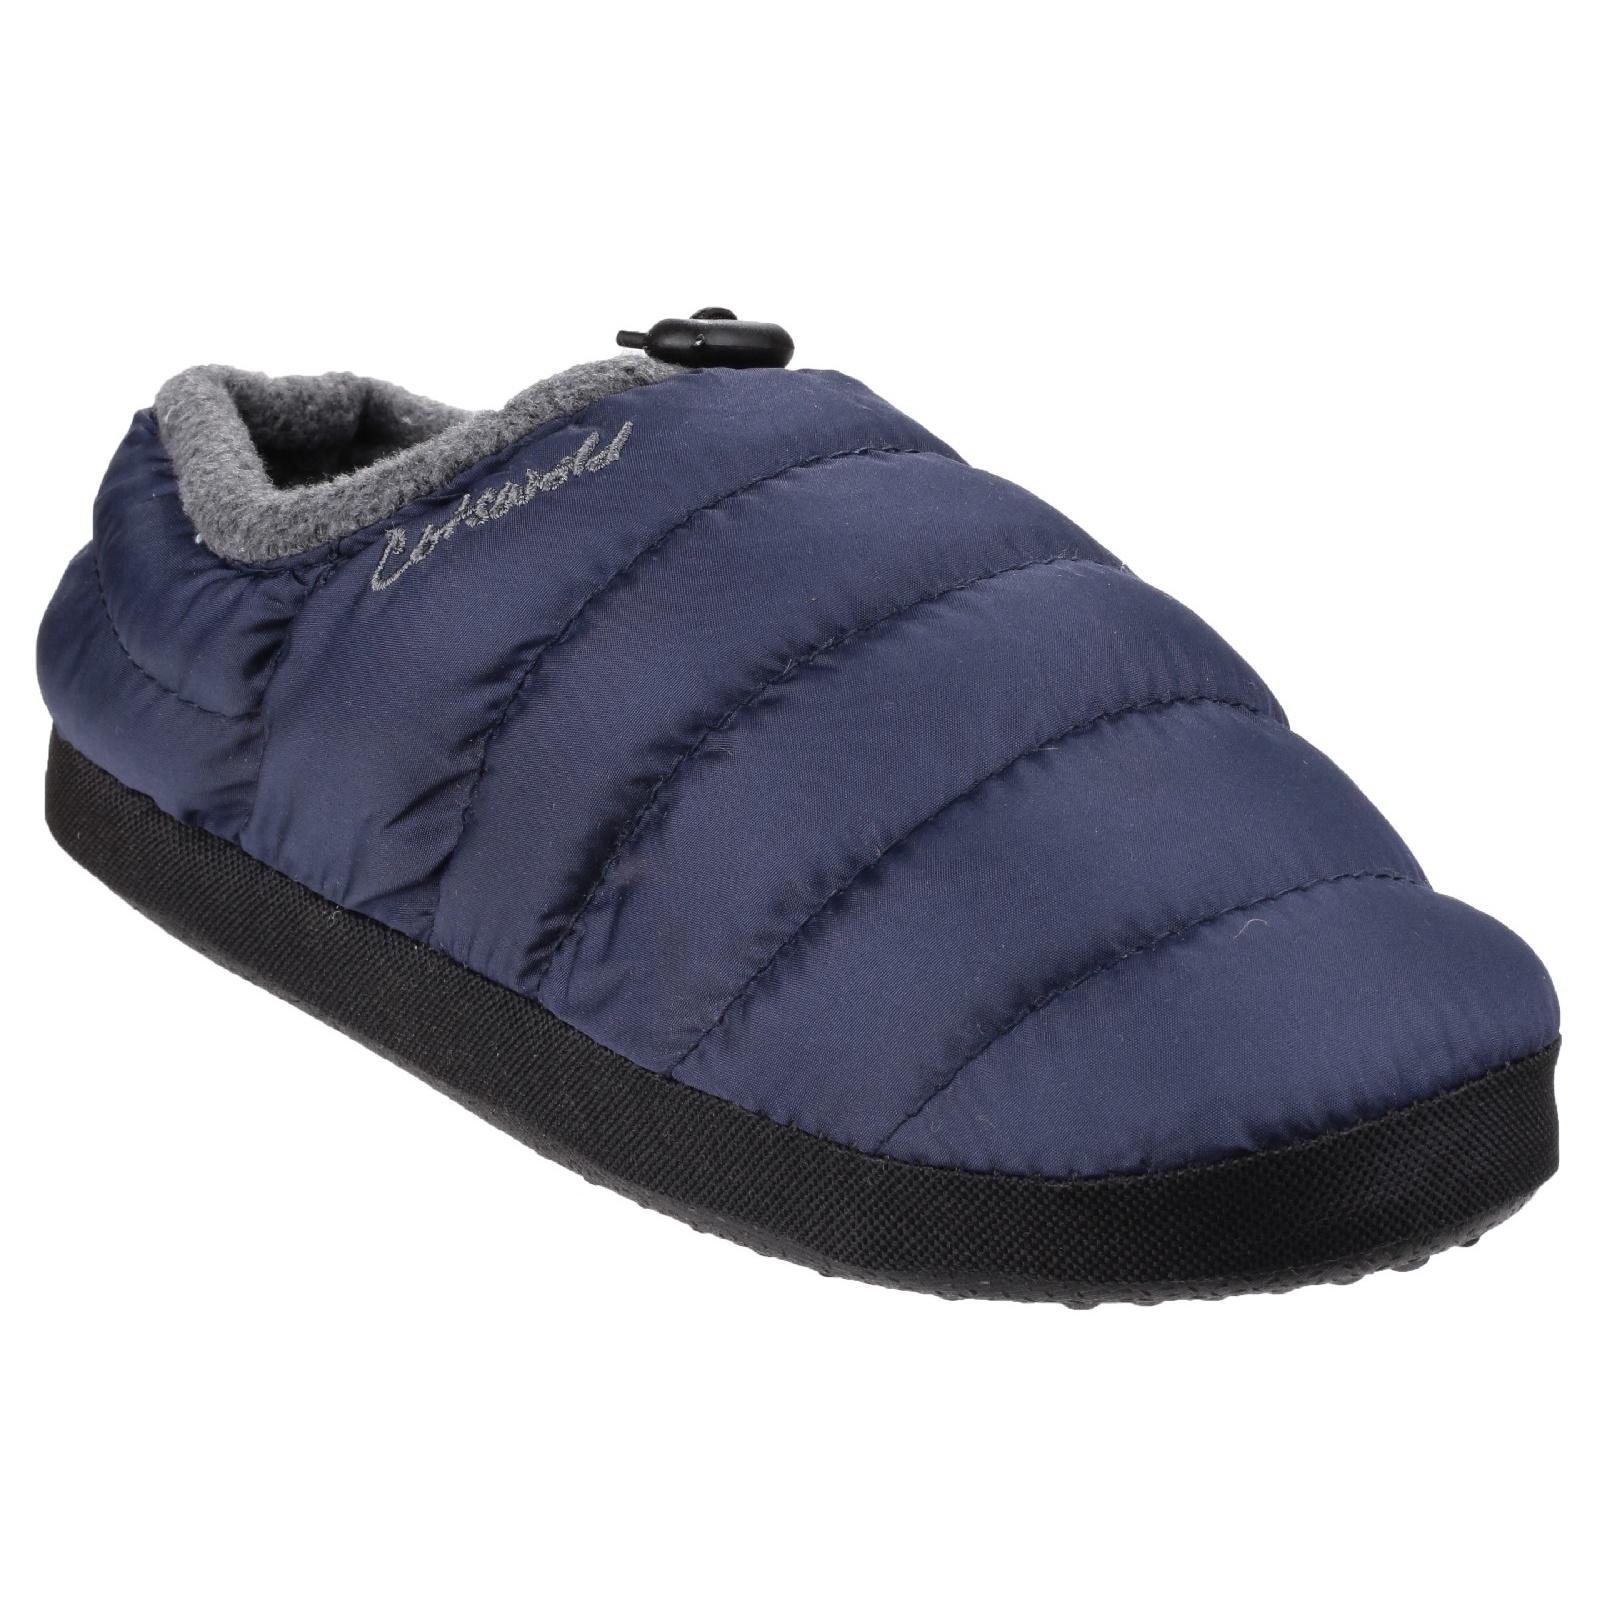 Cotswold zapatillas de andar por casa modelo camping - Zapatillas andar por casa originales ...